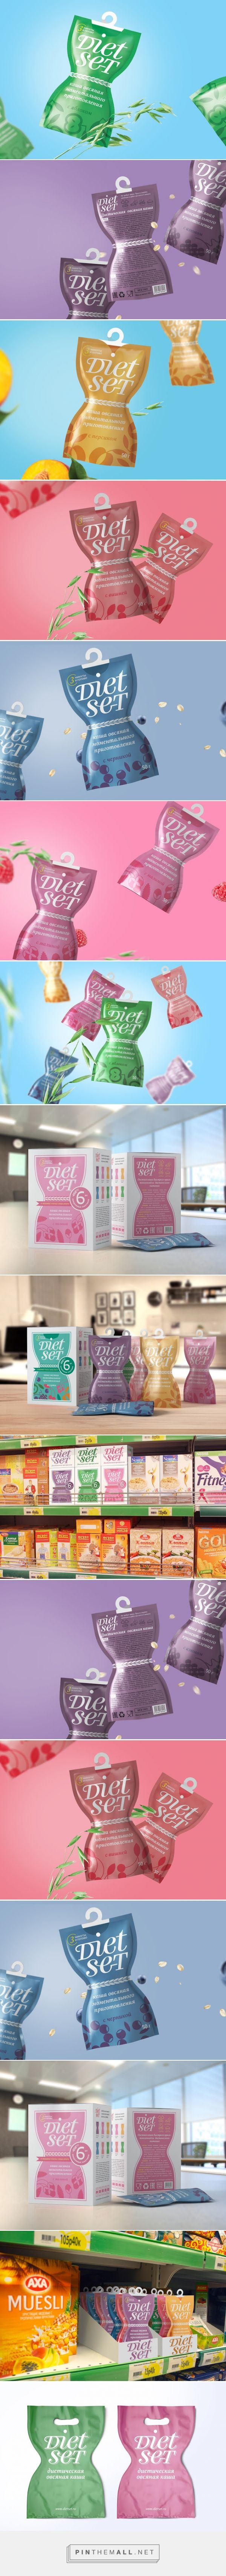 Diet Set - Instant #Cereals #concept #packaging